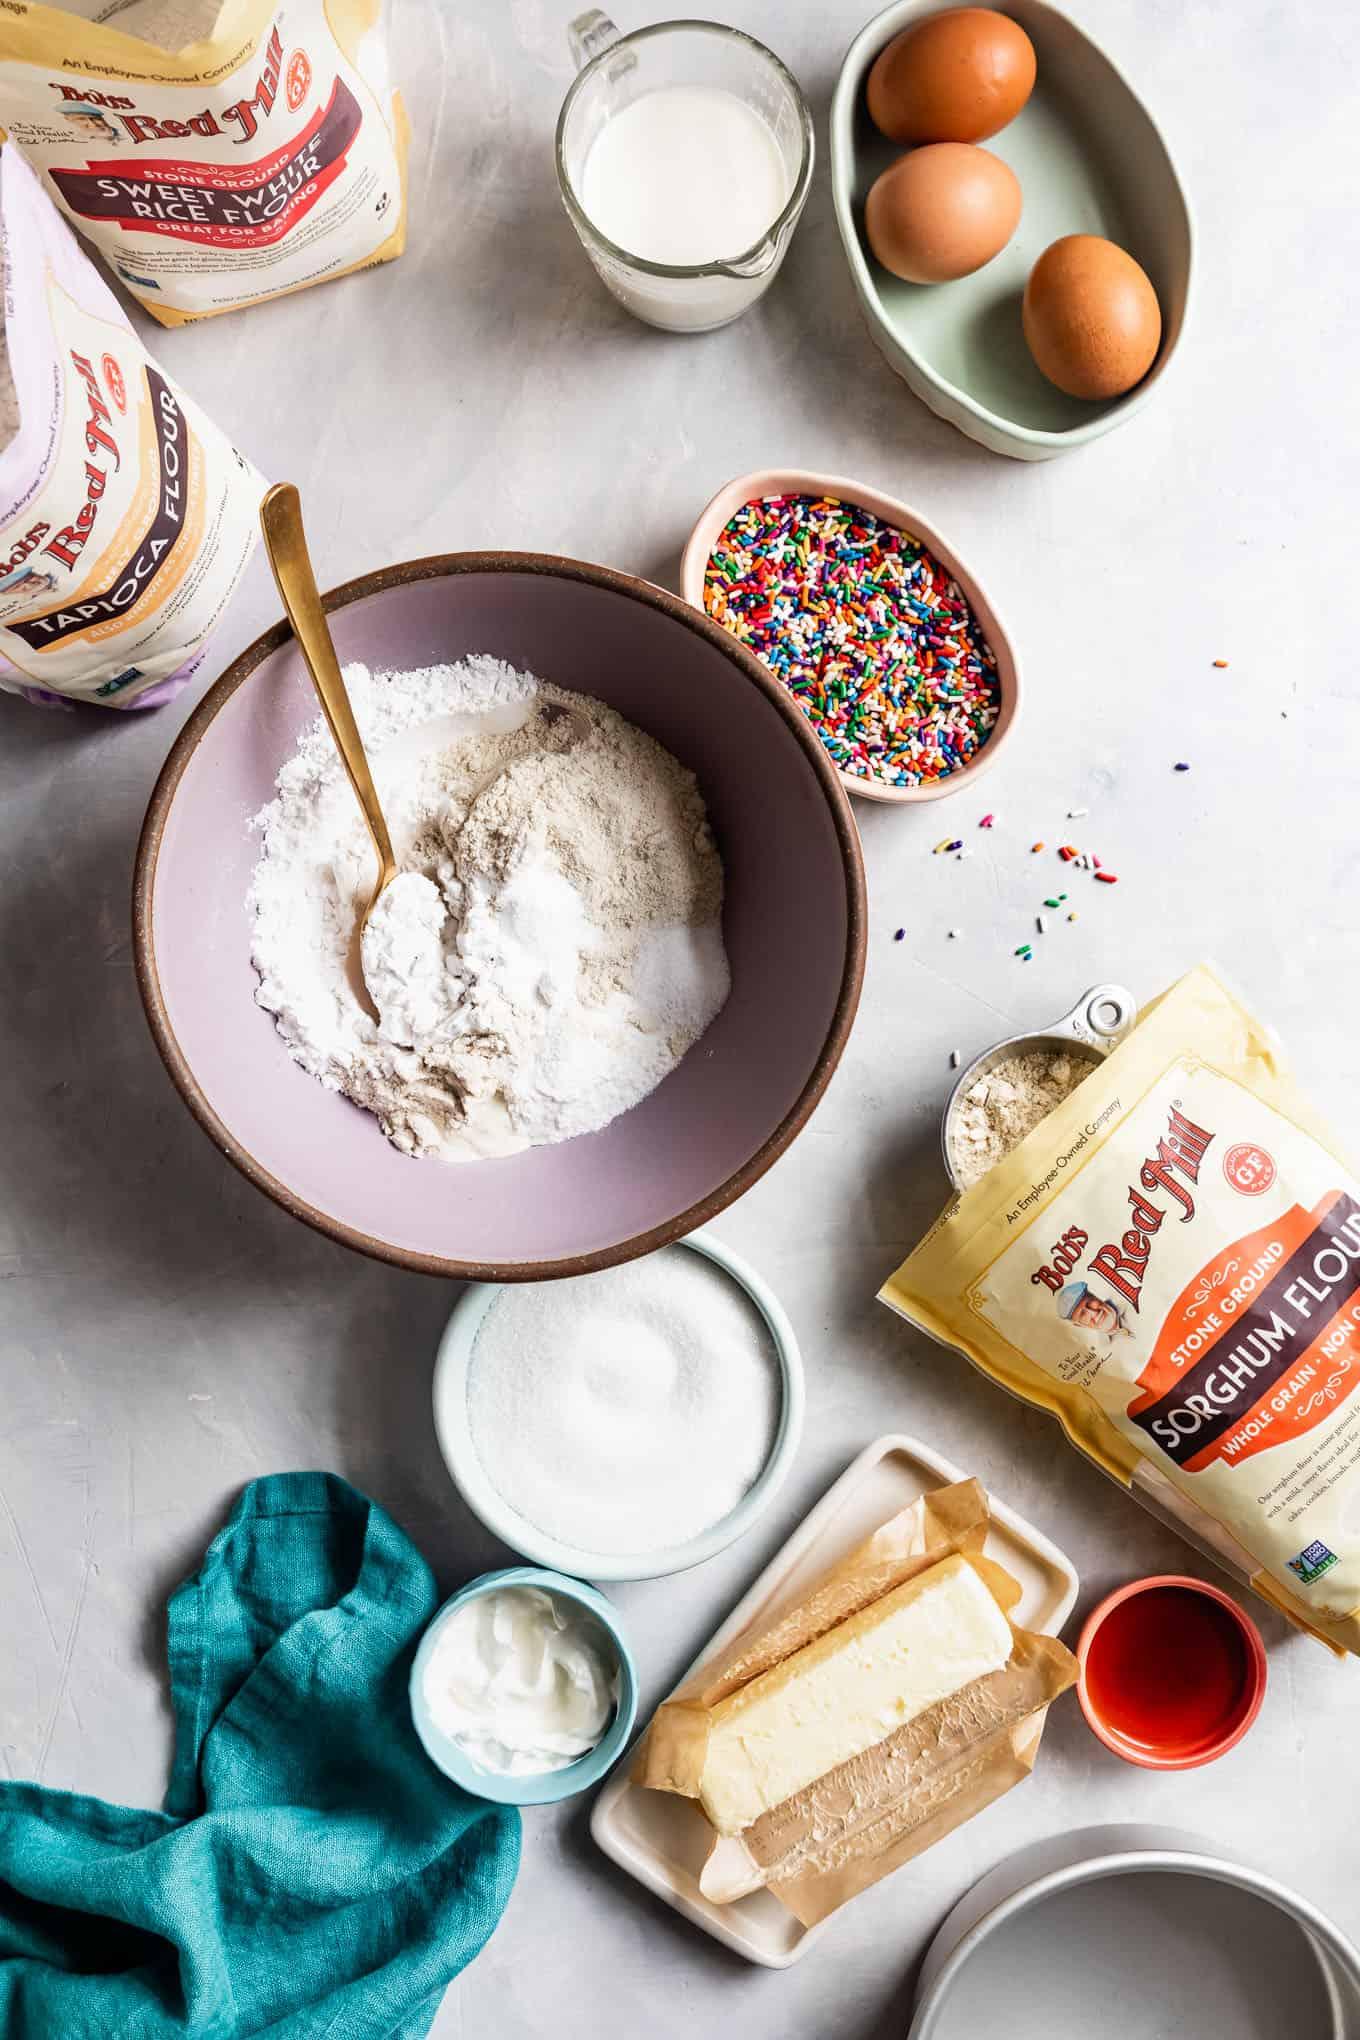 Ingredients for Gluten-Free Funfetti Cake